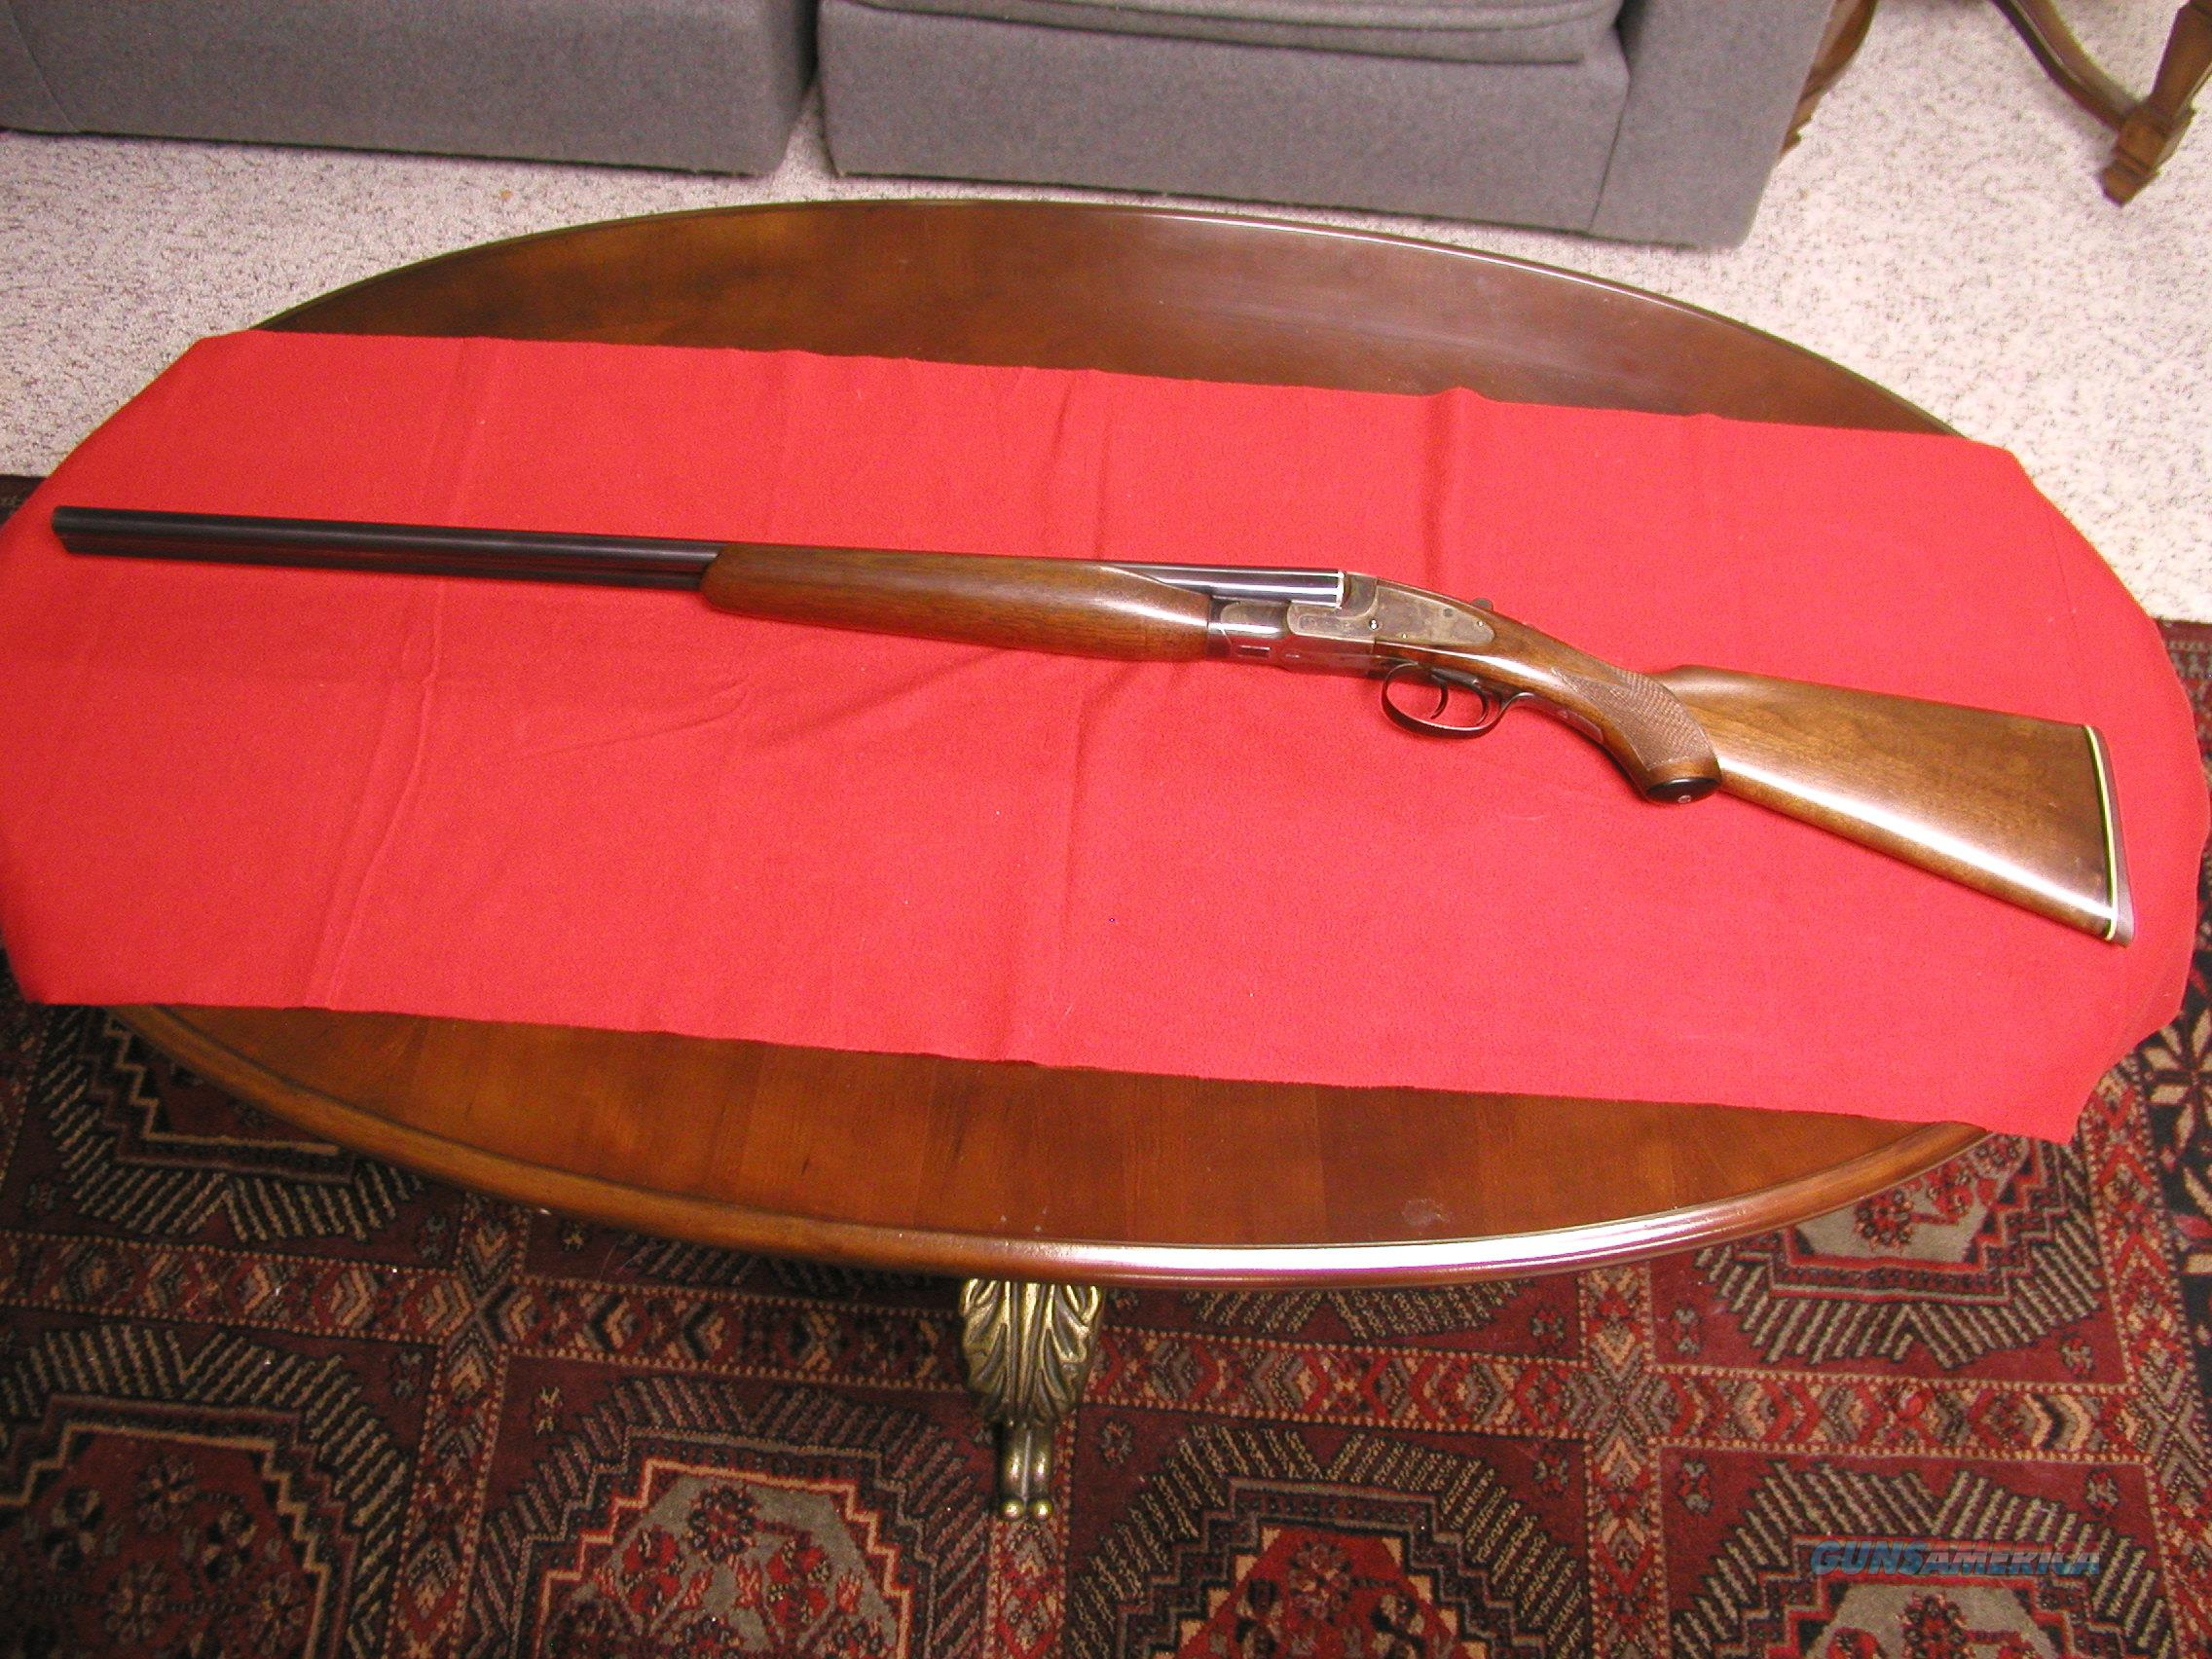 "L.C.Smith, Field, Feather Weight, 20 GA, 28"" Barrels, S/N FWS 226XX  Guns > Shotguns > L.C. Smith Shotguns"